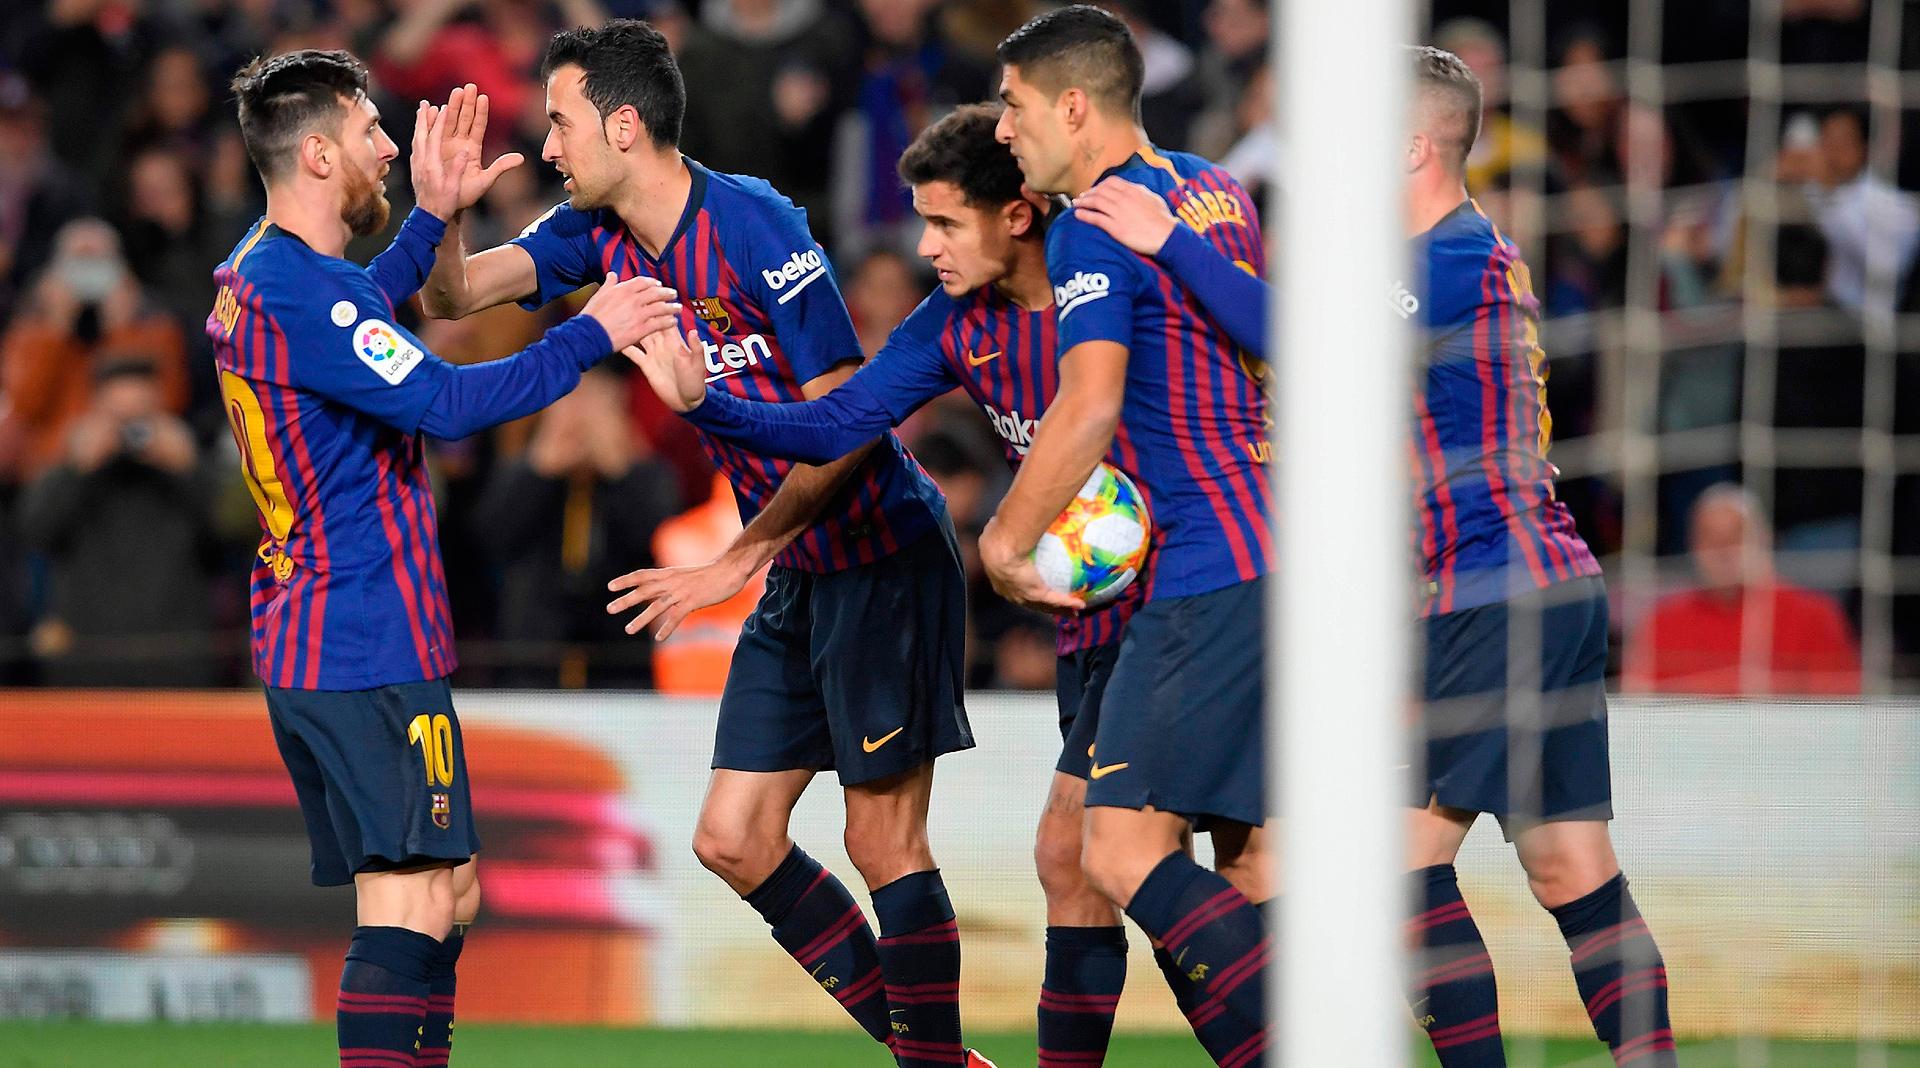 Así llega el Barça al primer Clásico de Copa